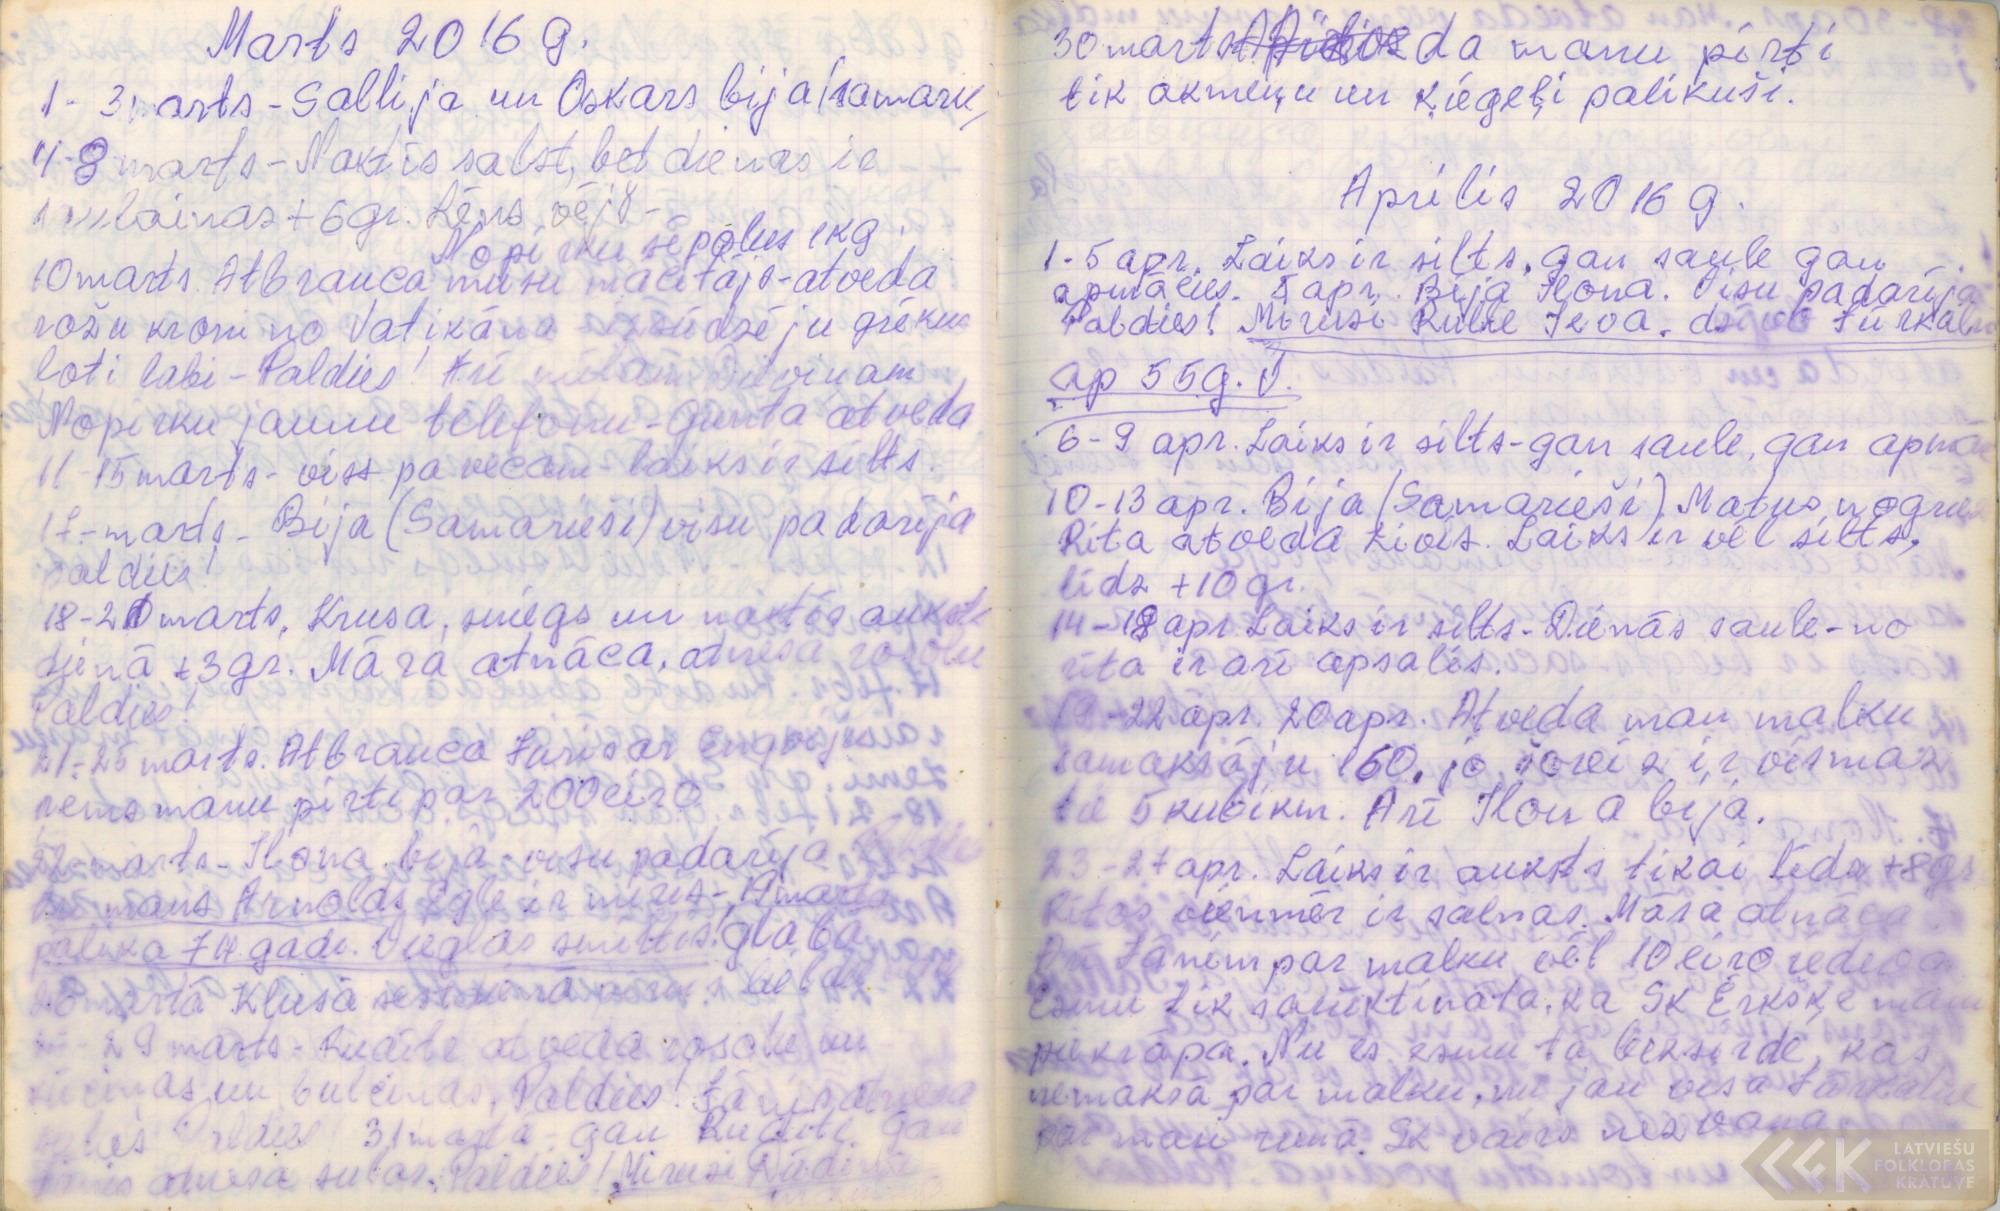 Ak139-Zigridas-Paegles-dienasgramatas-06-0099